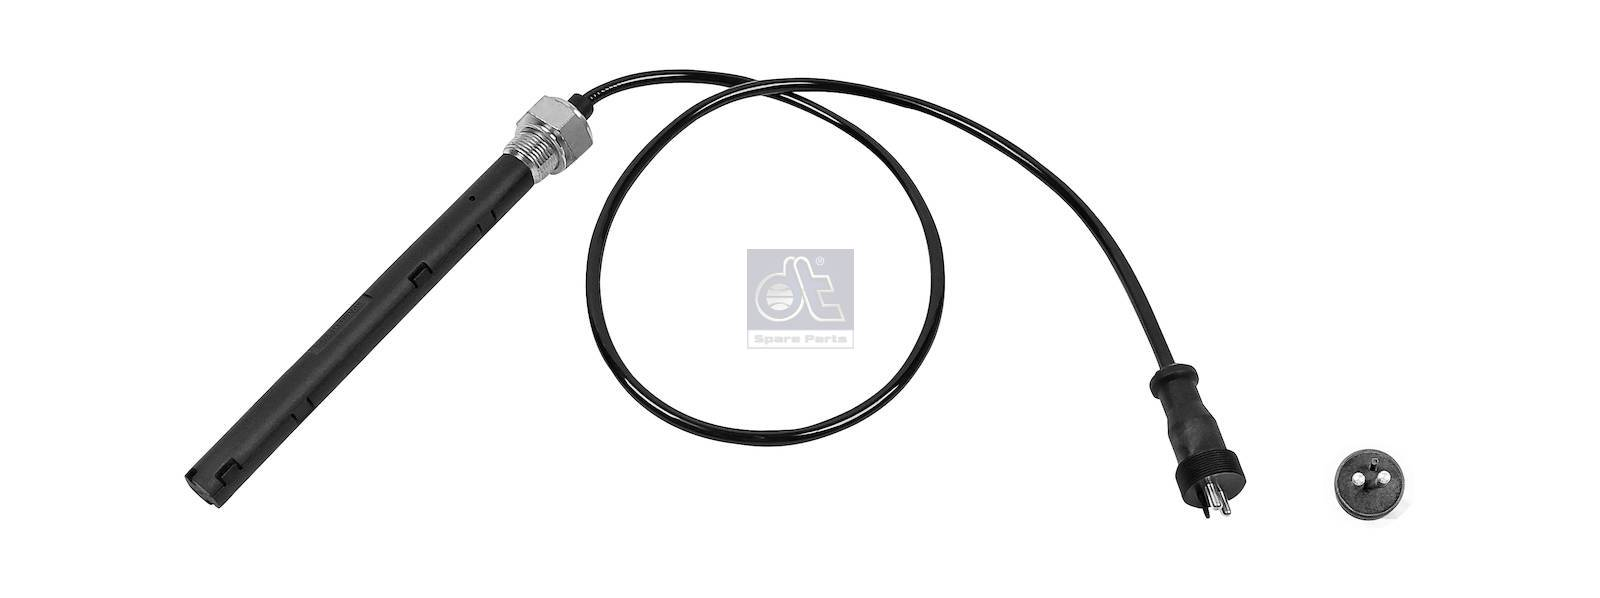 DT 4 62932 Oil level sensor 0041530228 suitable for Mercedes-Benz